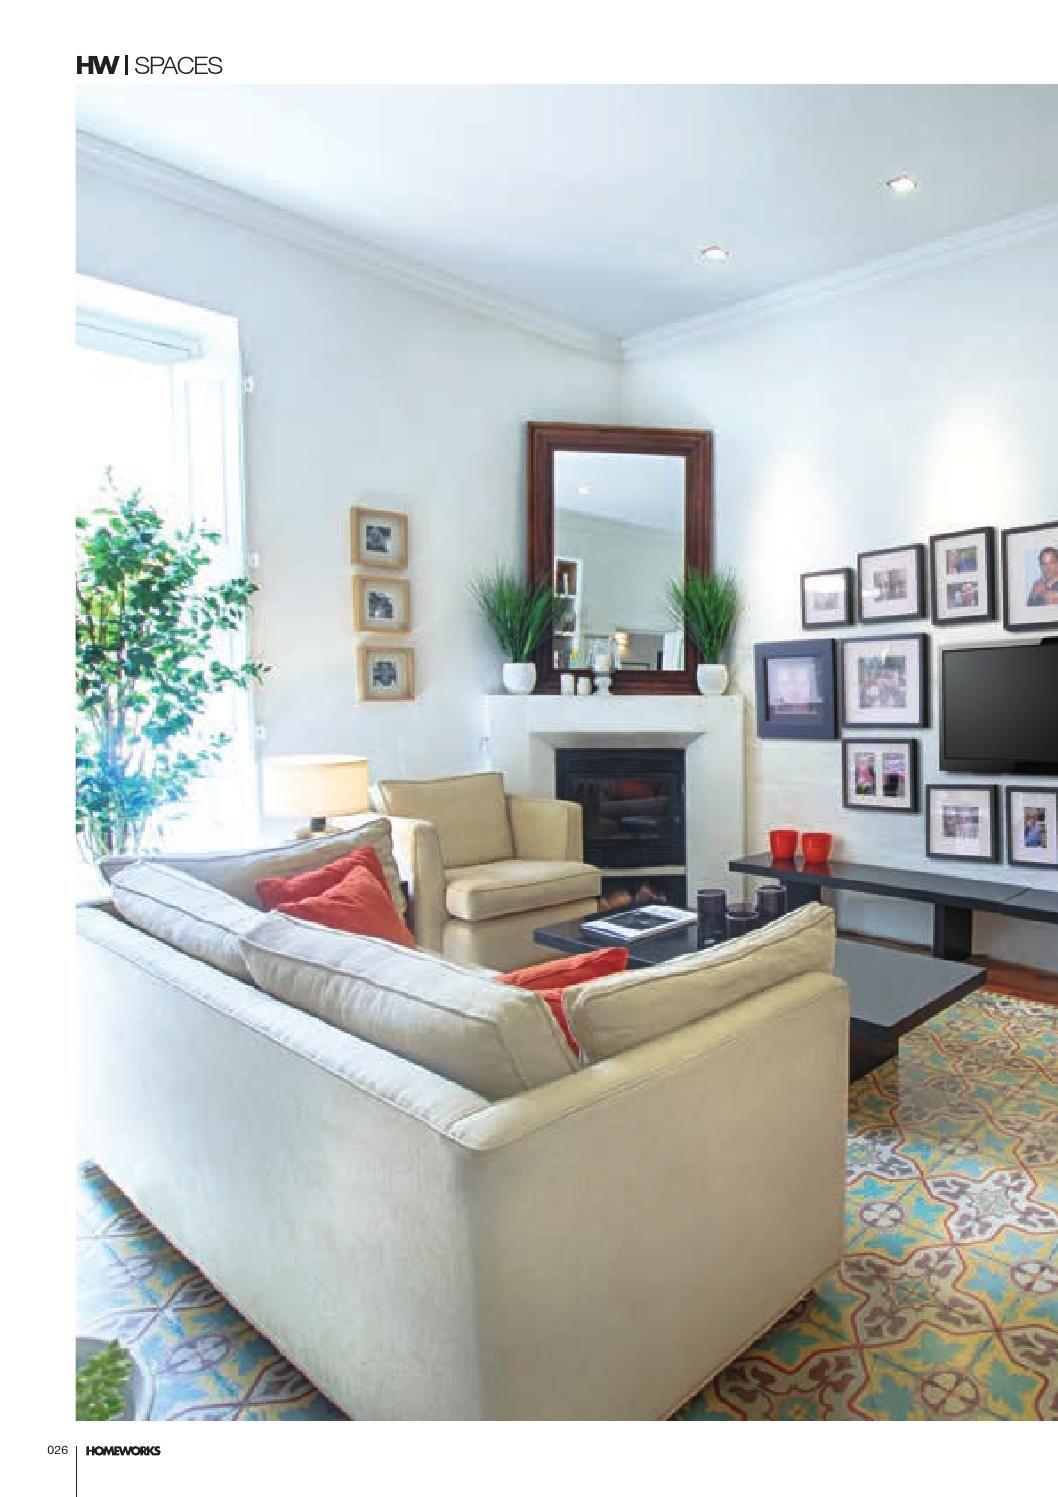 Homeworks custom interiors ltd